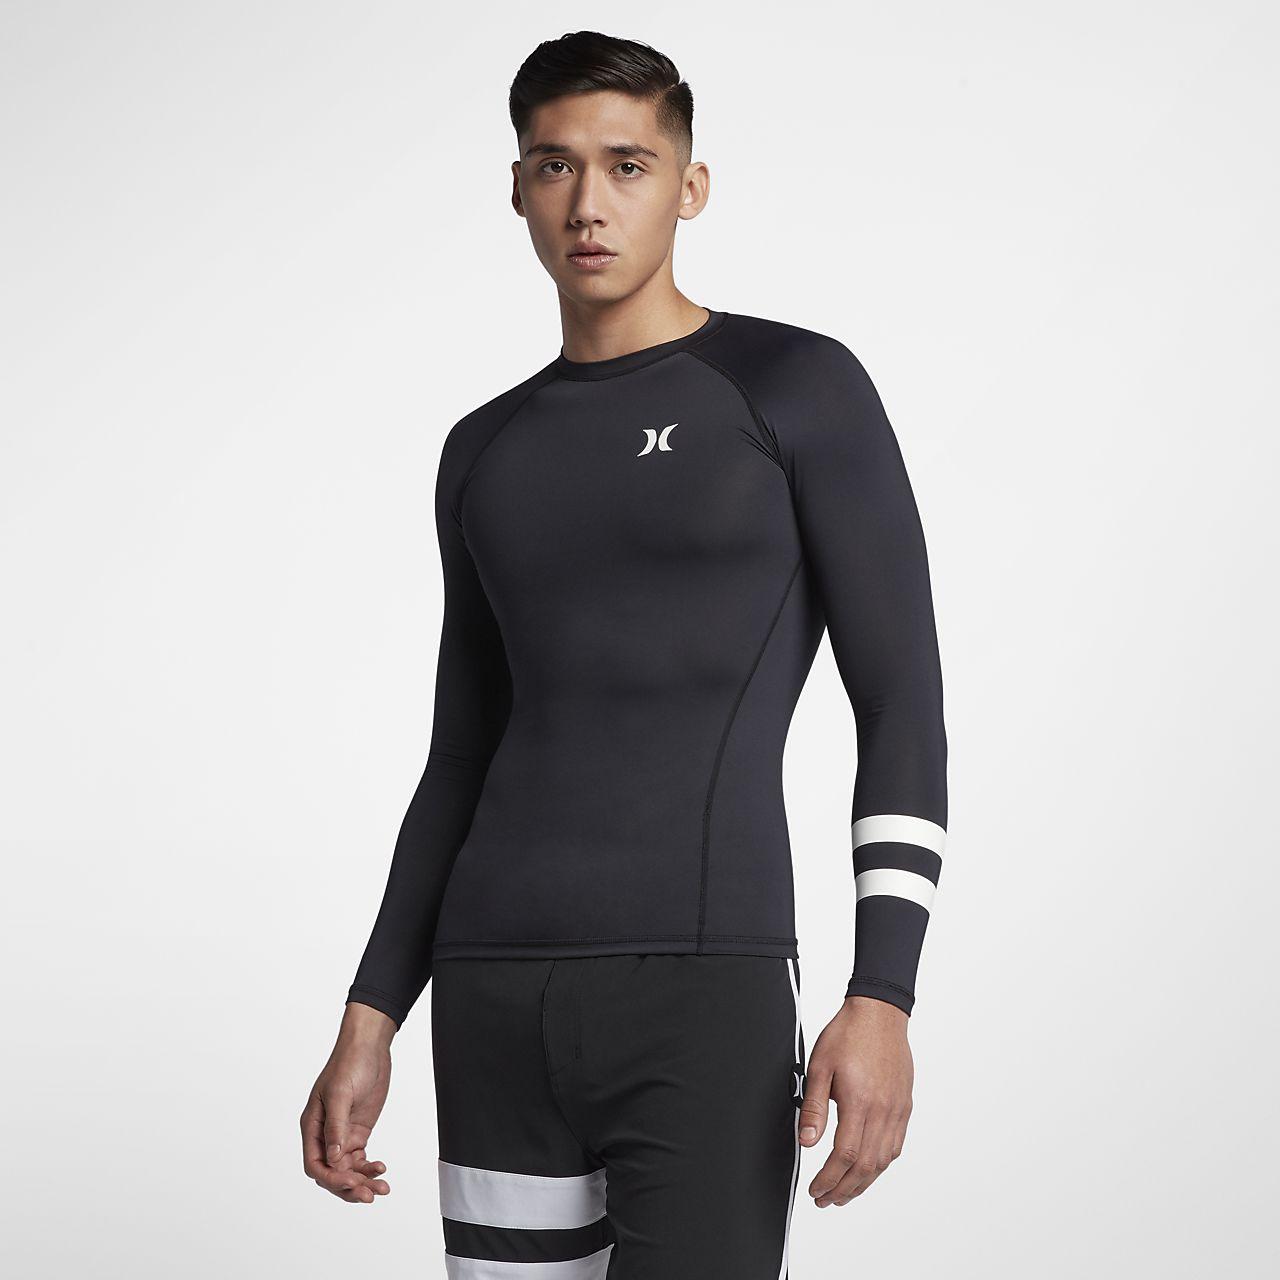 Hurley Pro Light Langarm-Surf-Shirt für Herren